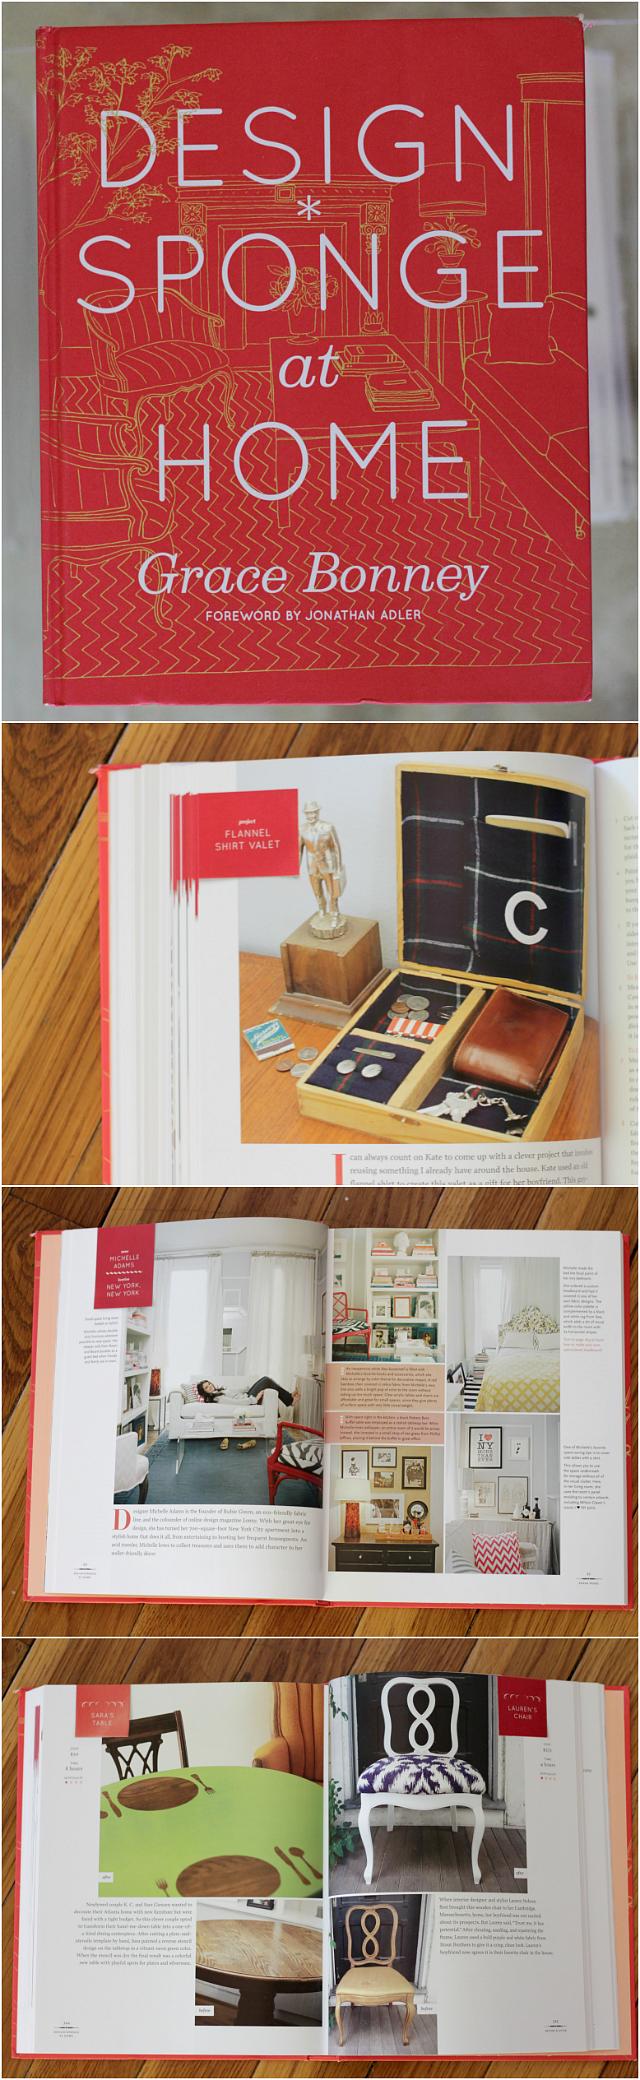 The best design books for decor lovers!